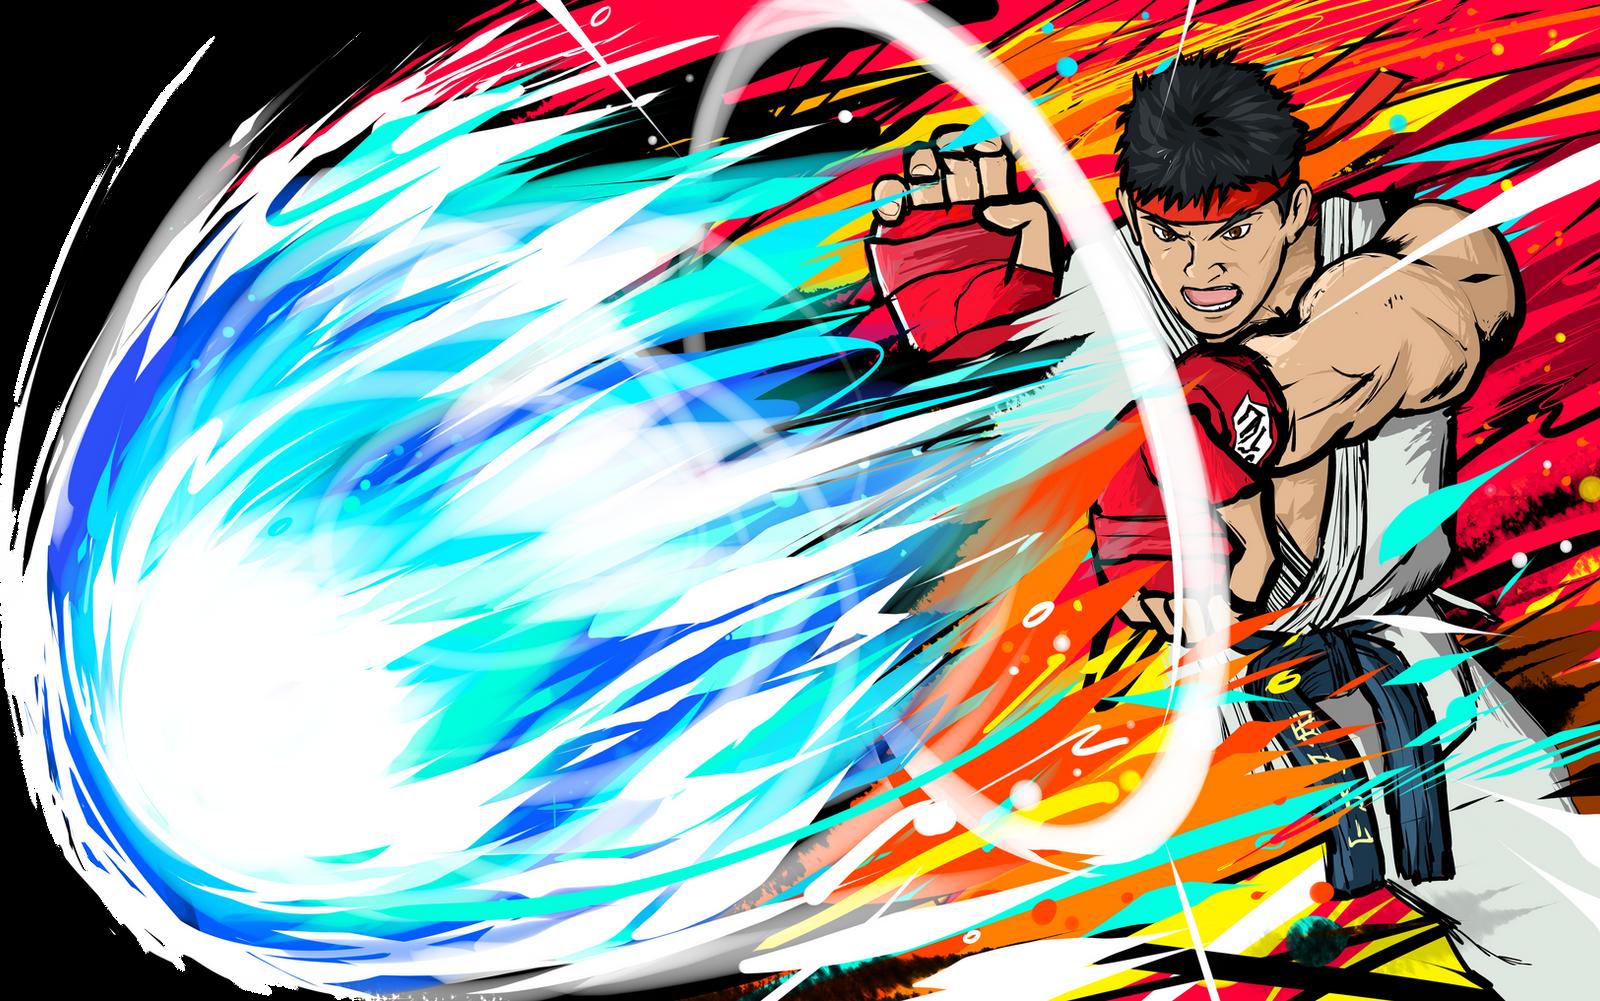 Ryu | Hadoken by ishmam on DeviantArt